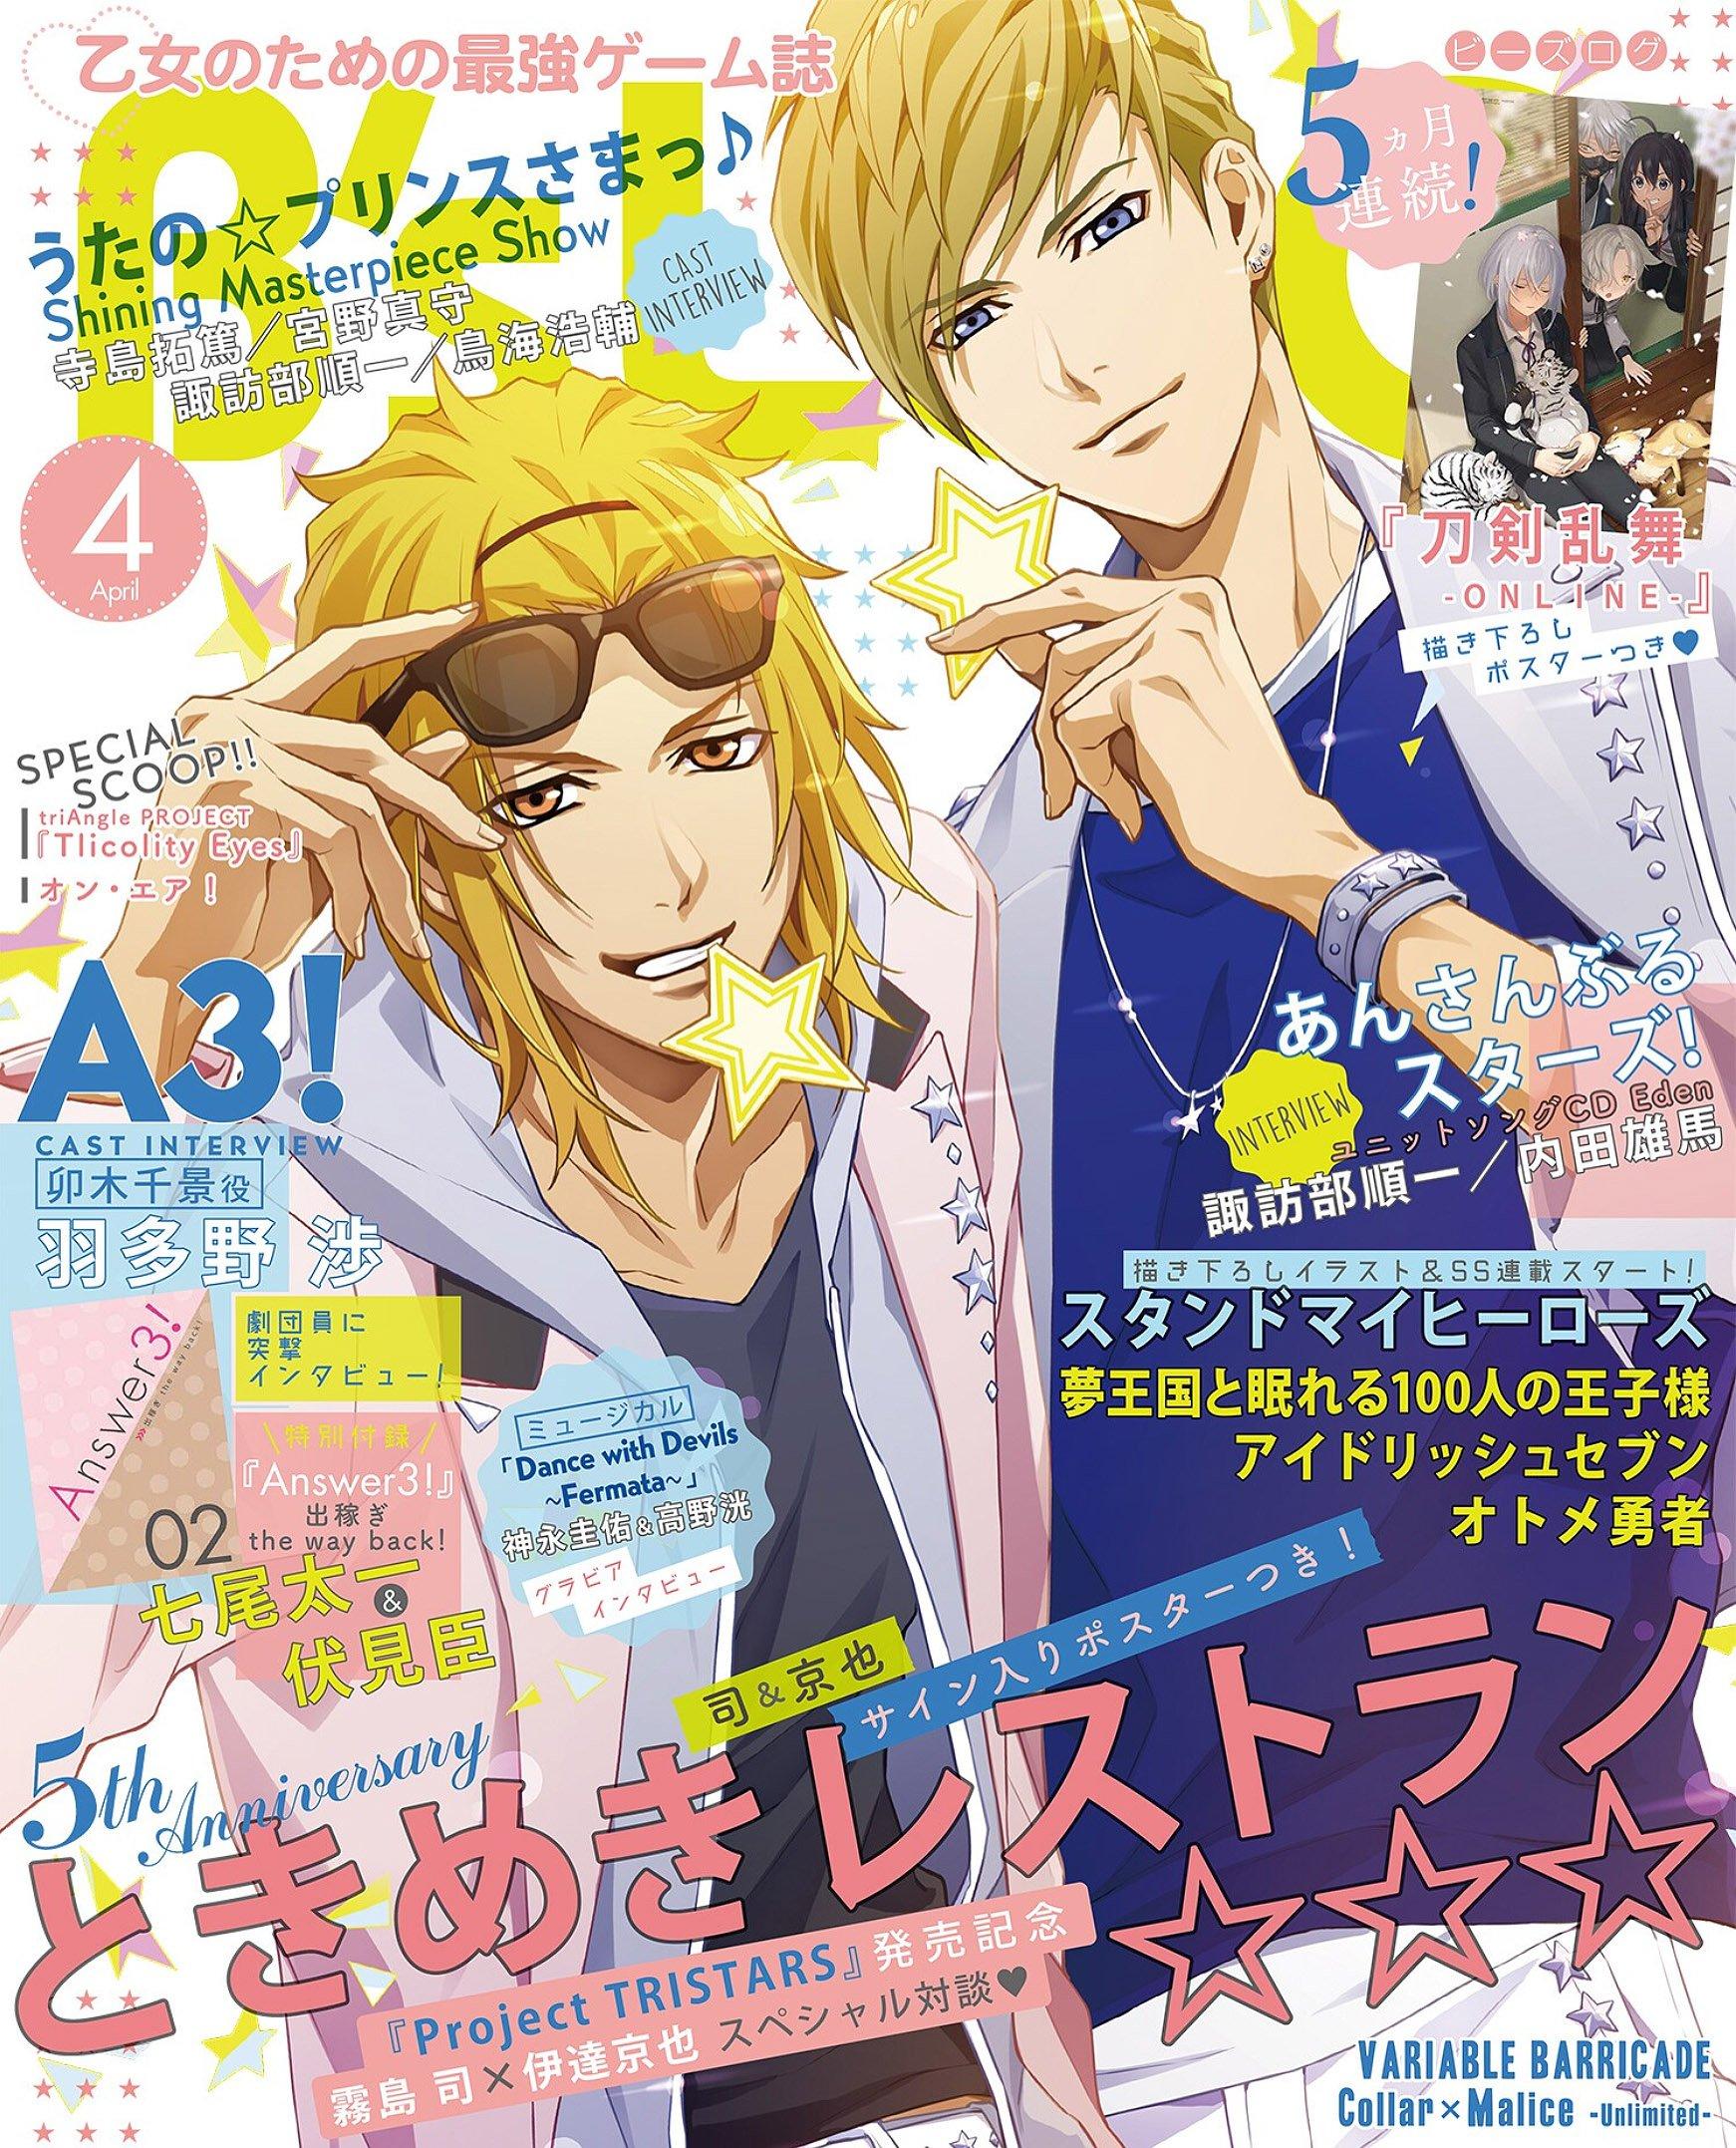 B's-LOG Issue 179 (April 2018)